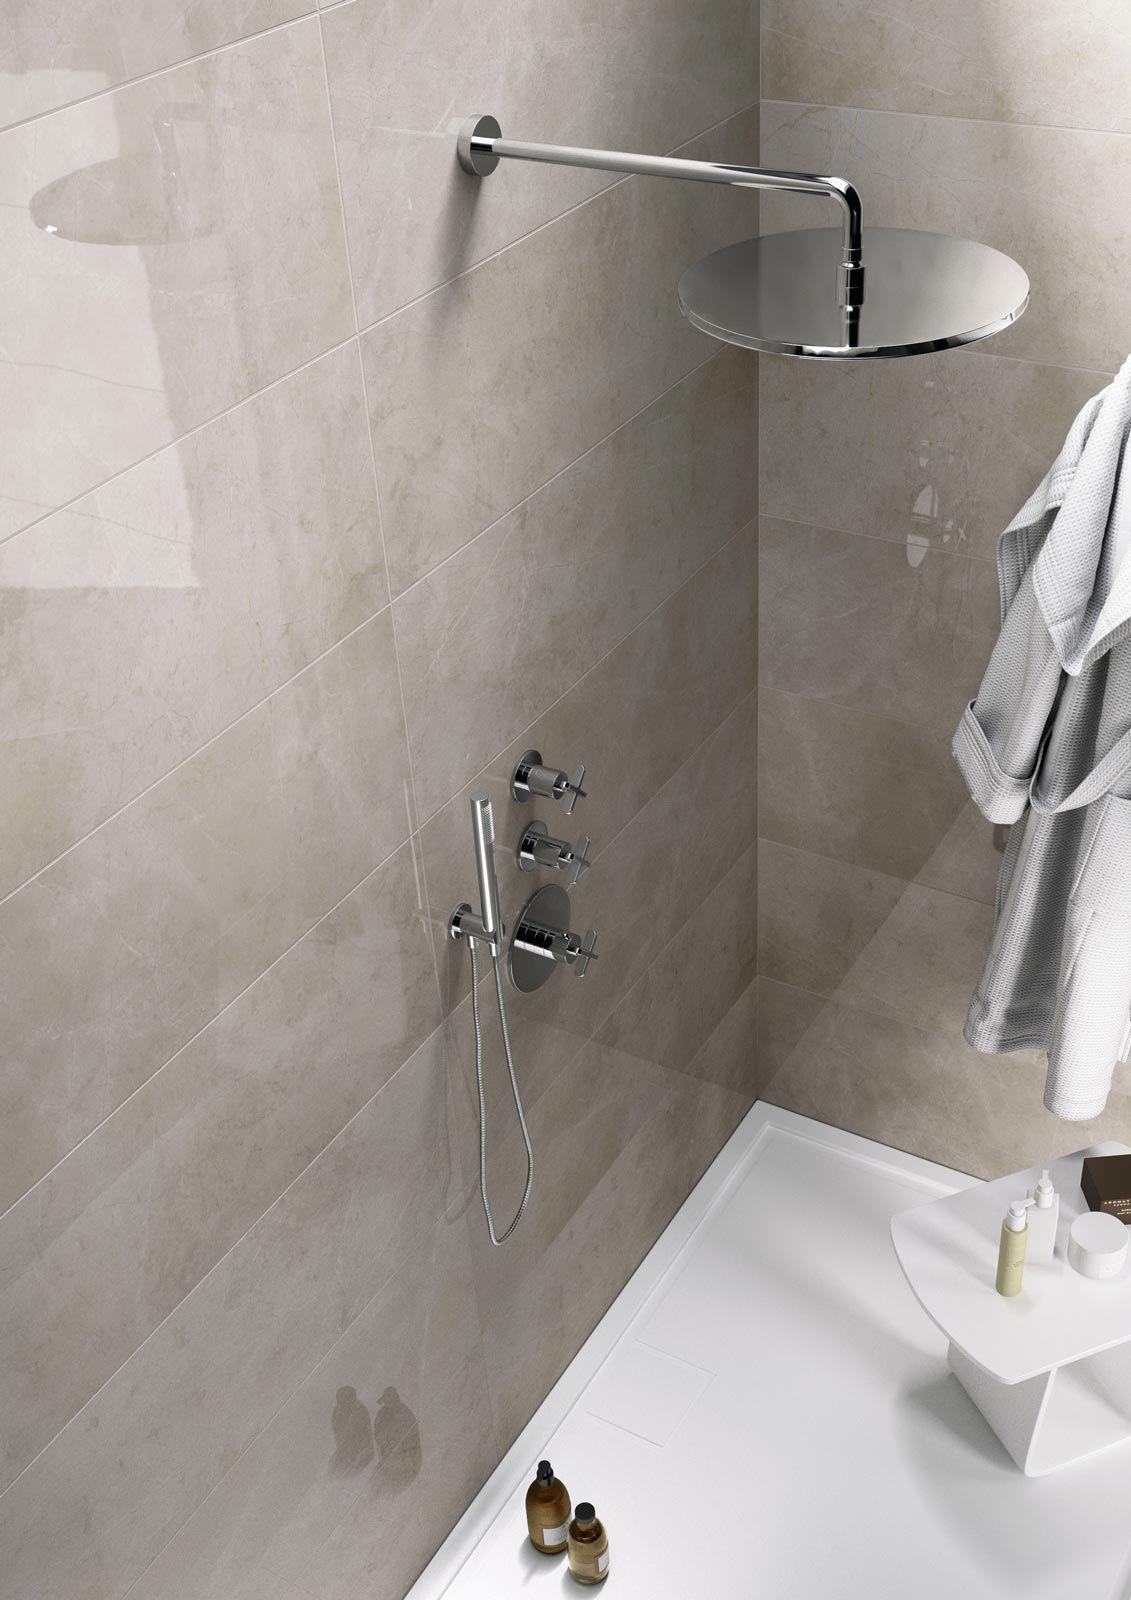 Evolutionmarble Rivestimento Ceramic Tiles Marazzi_6358 Bagni